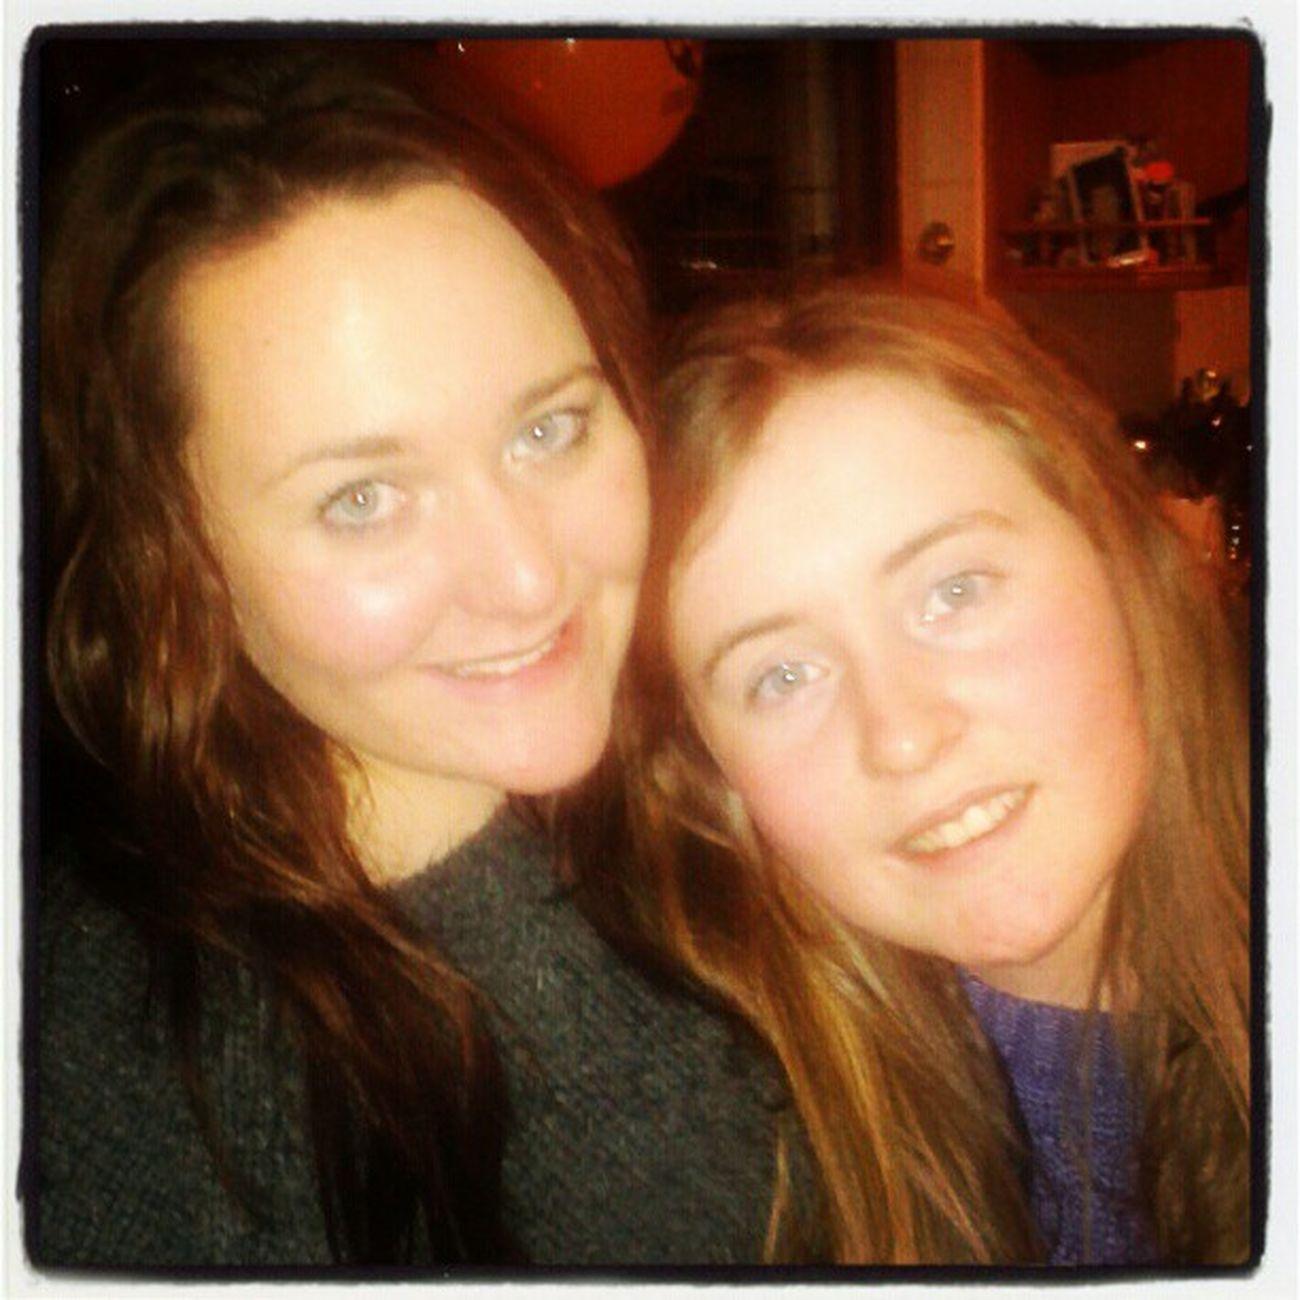 mini-me Eilis Havingthecraic SistaSista  Sister weesister instapose instadaily toomuchcake cute loveher twins